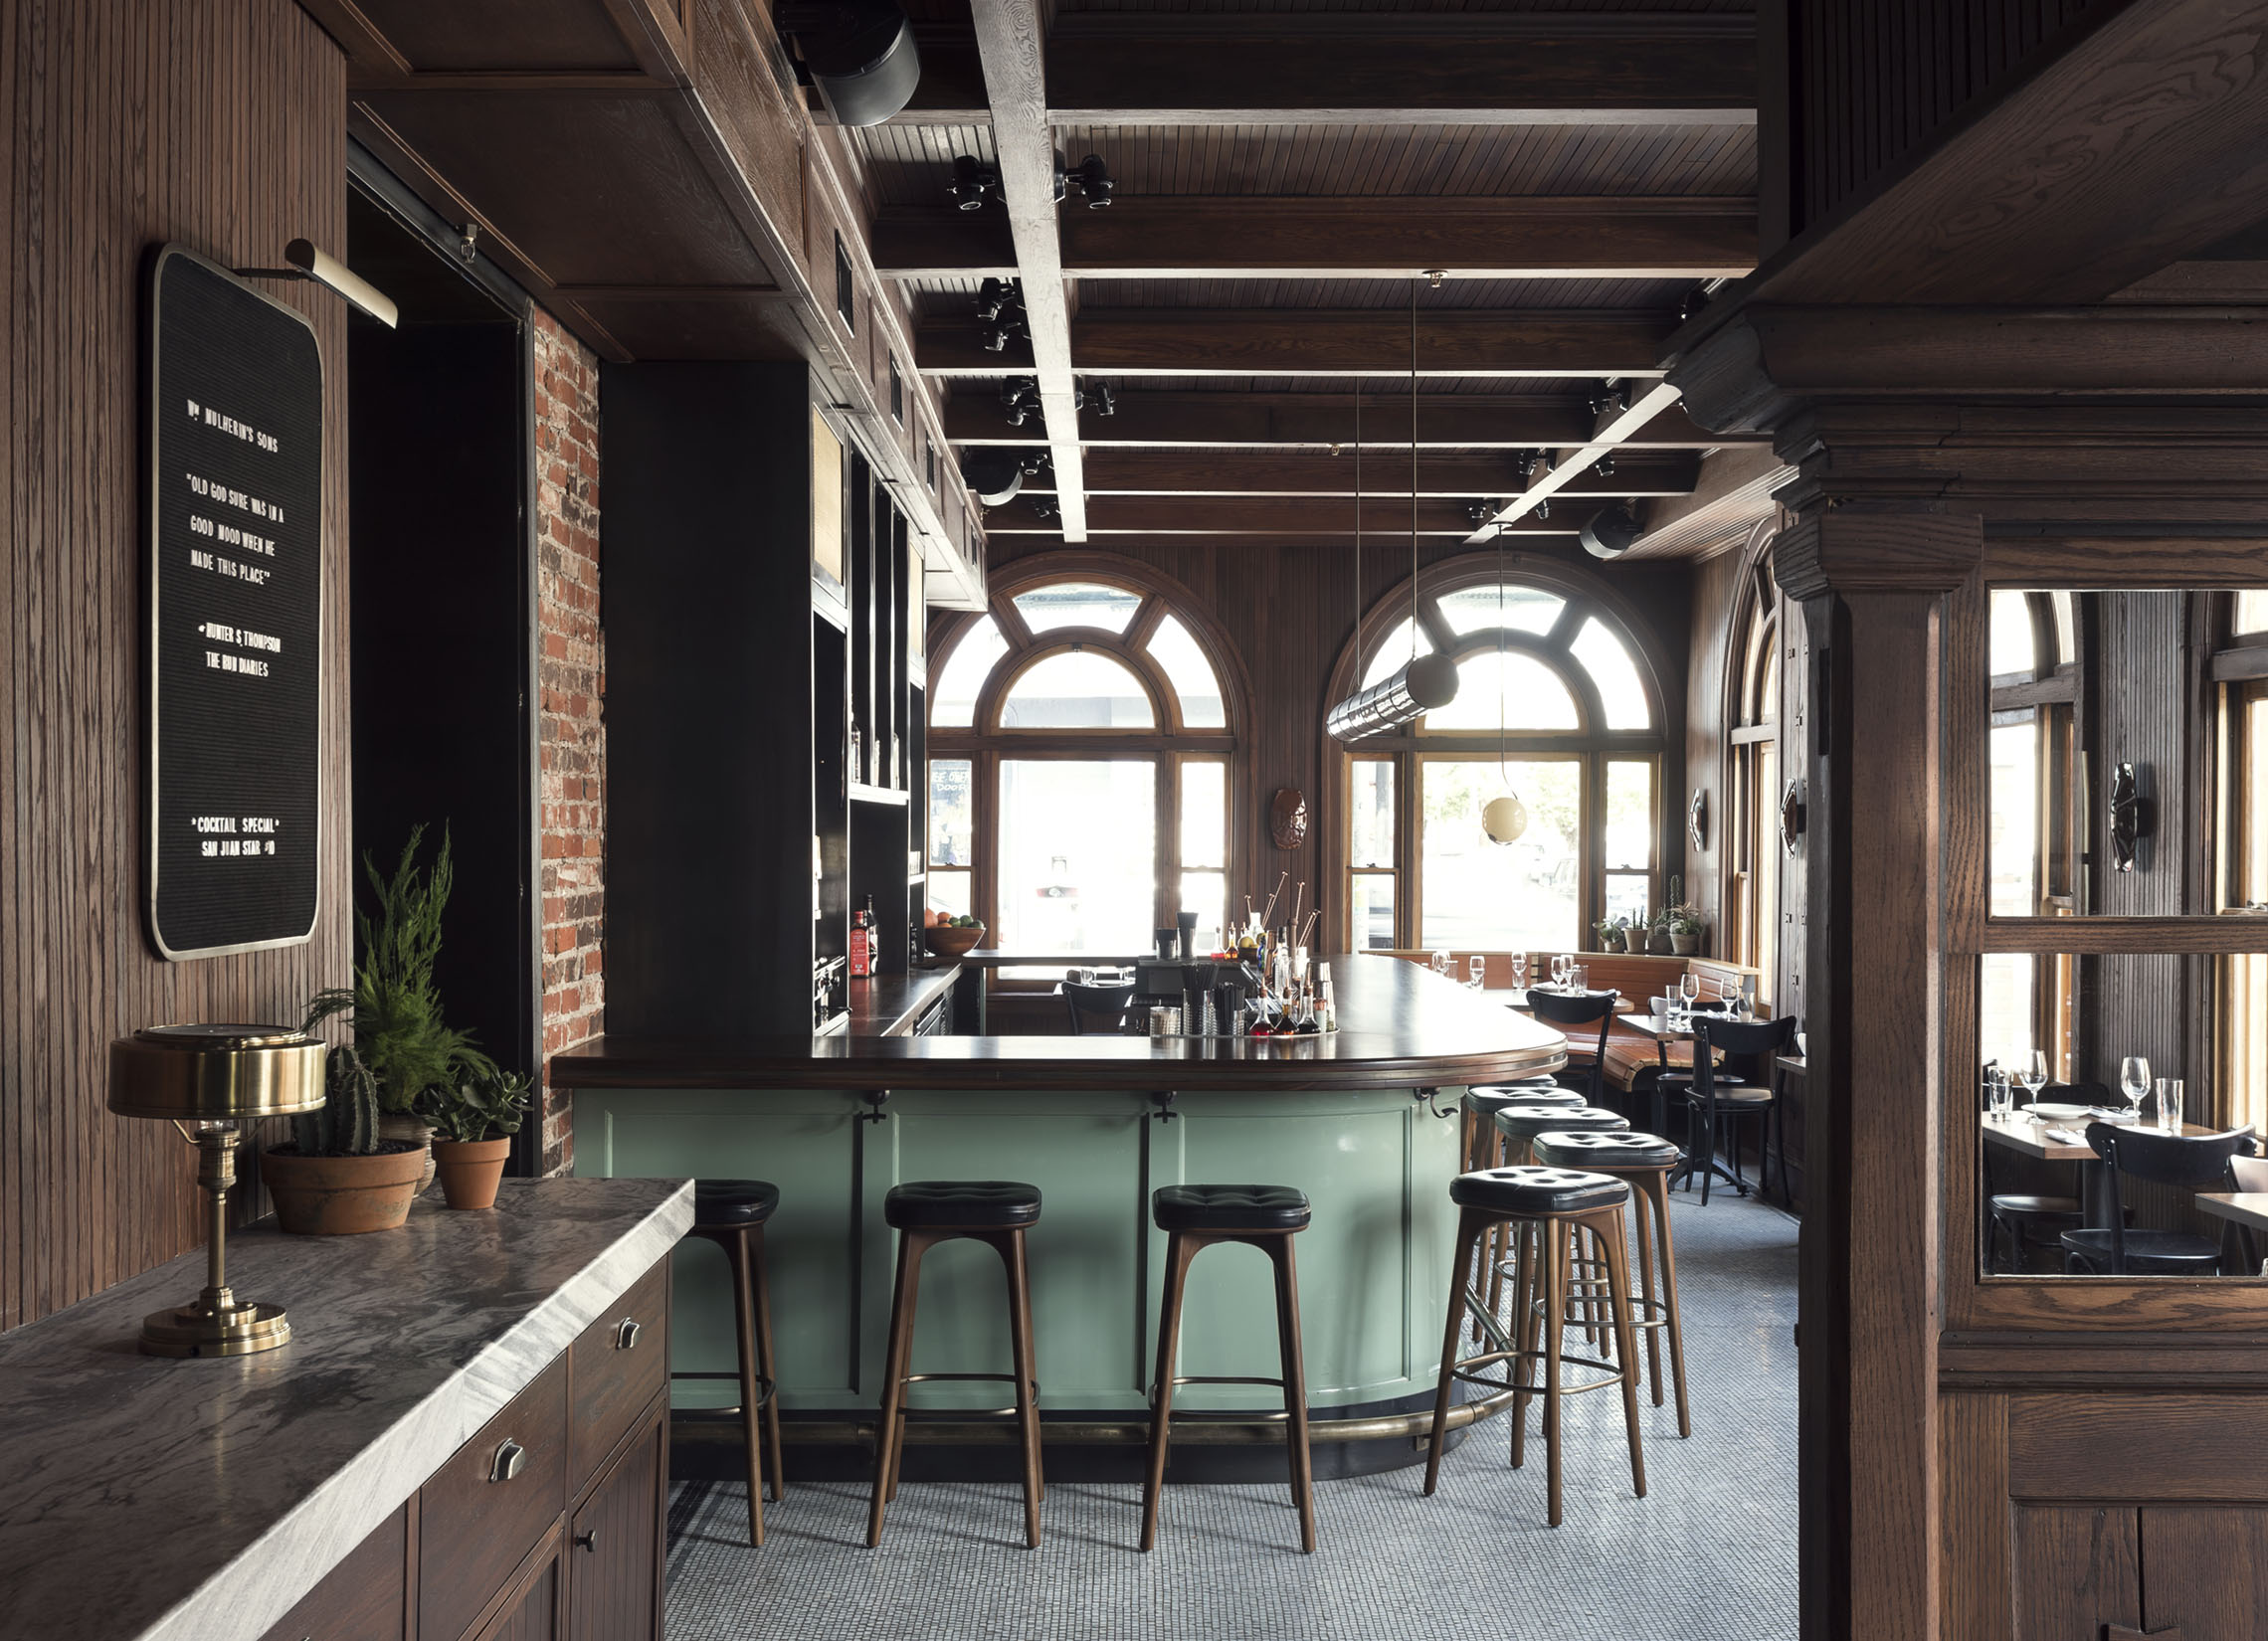 wm mulherin s sons restaurant and hotel philadelphia nuvo. Black Bedroom Furniture Sets. Home Design Ideas